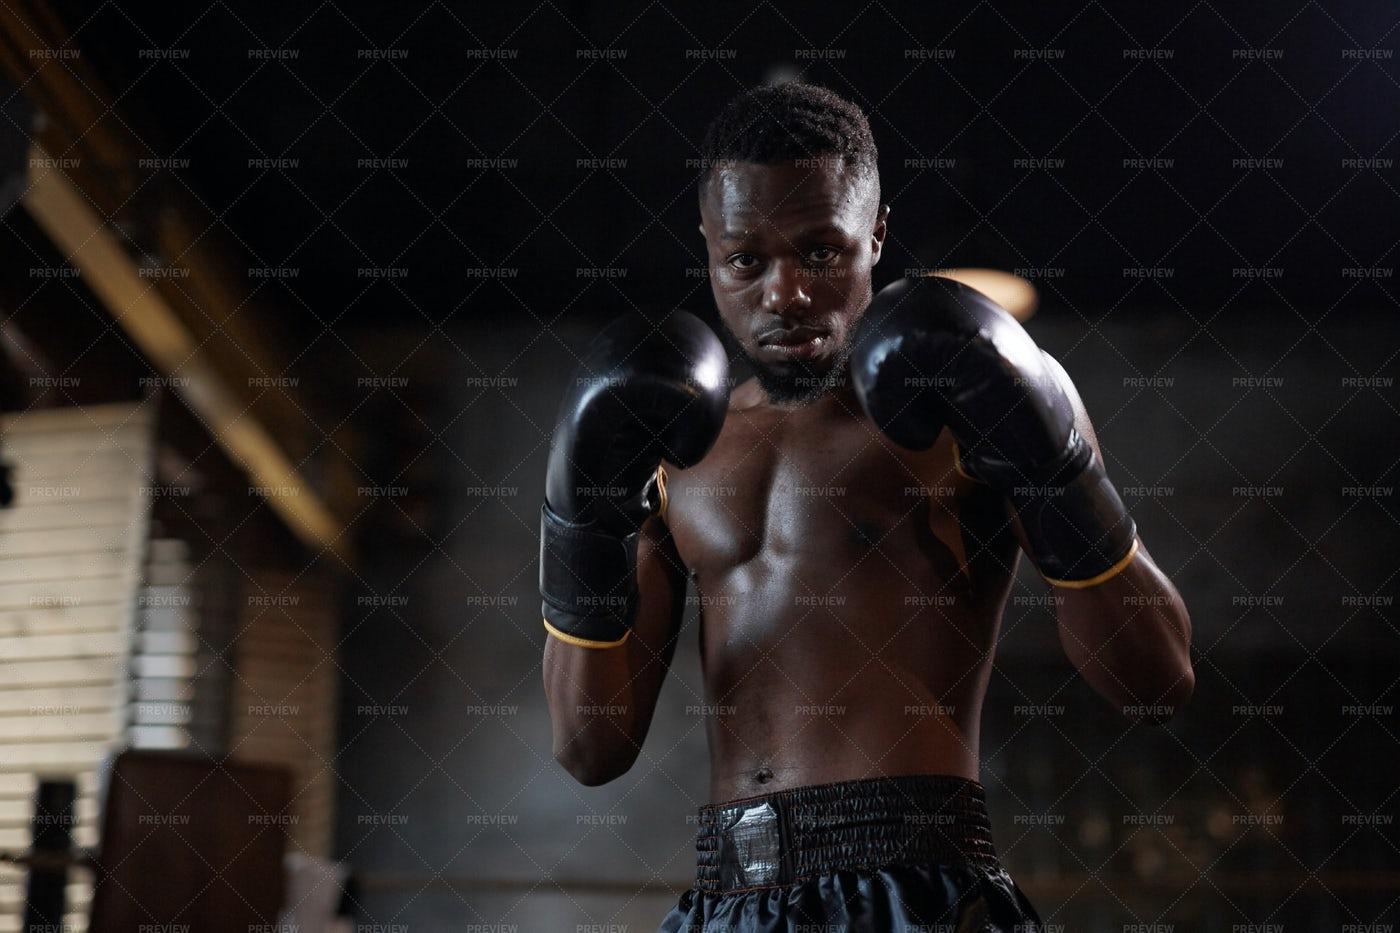 Boxer Portrait With Copy Space: Stock Photos